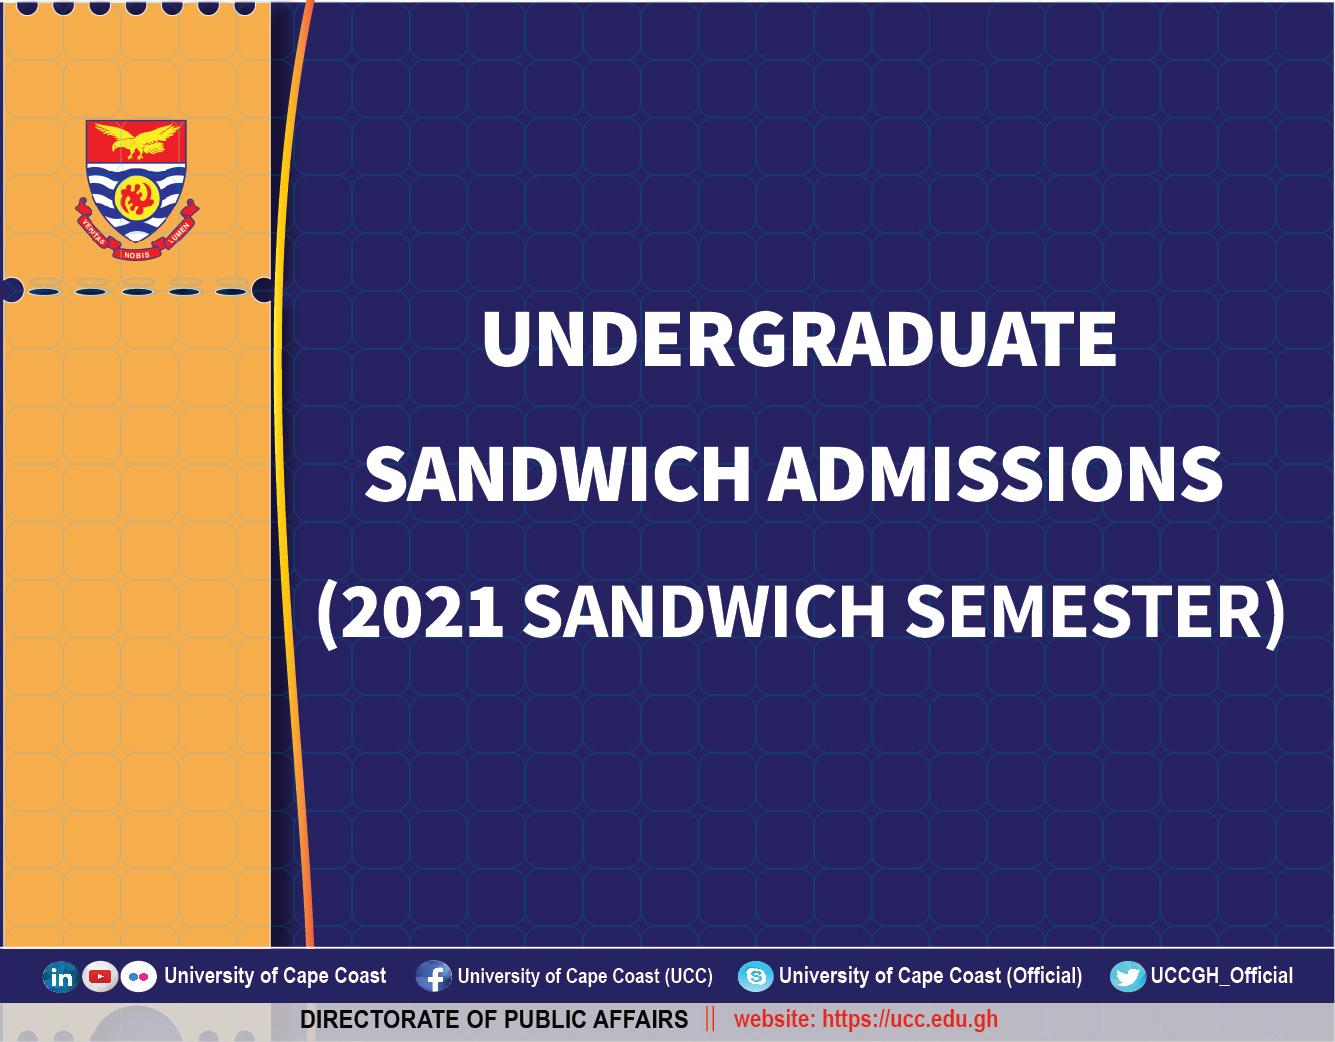 Undergraduate Sandwich Admissions